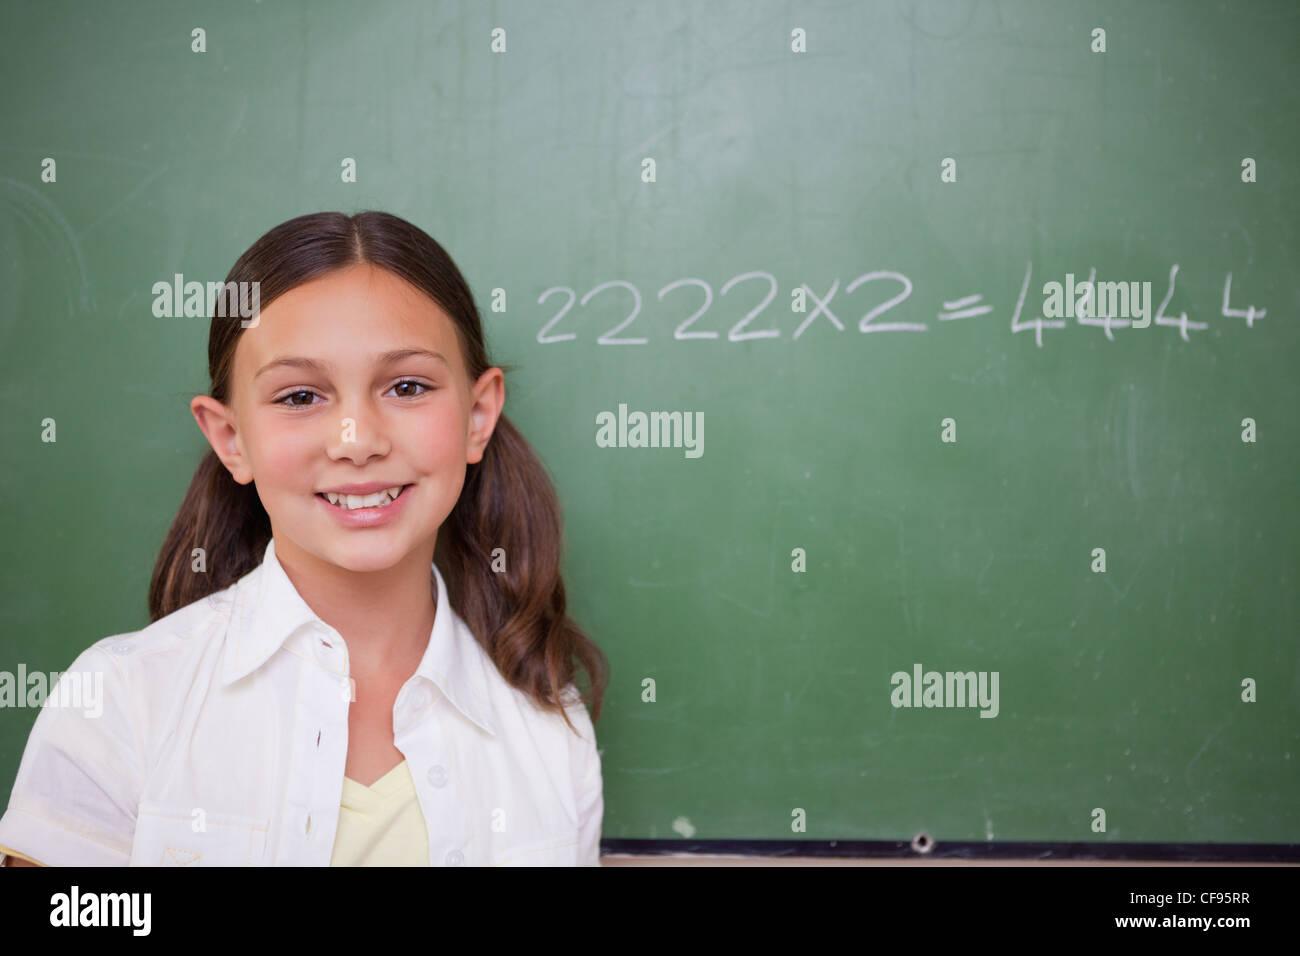 Schoolgirl posing in front of a chalkboard - Stock Image